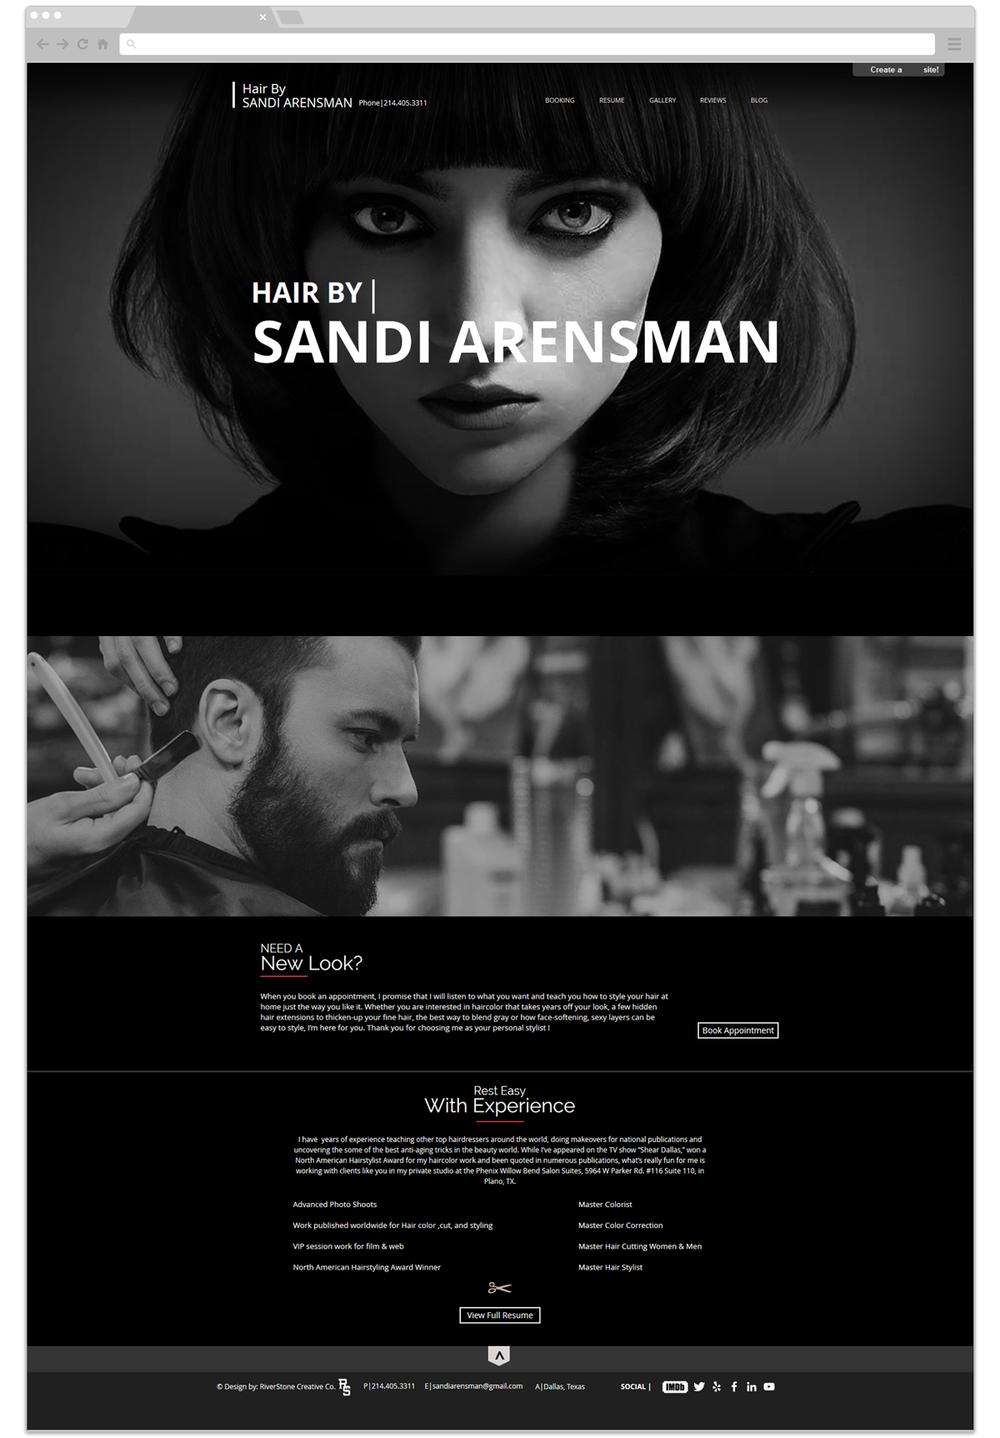 river-stone-creative-co-websites-sandi-arensman-hair-1